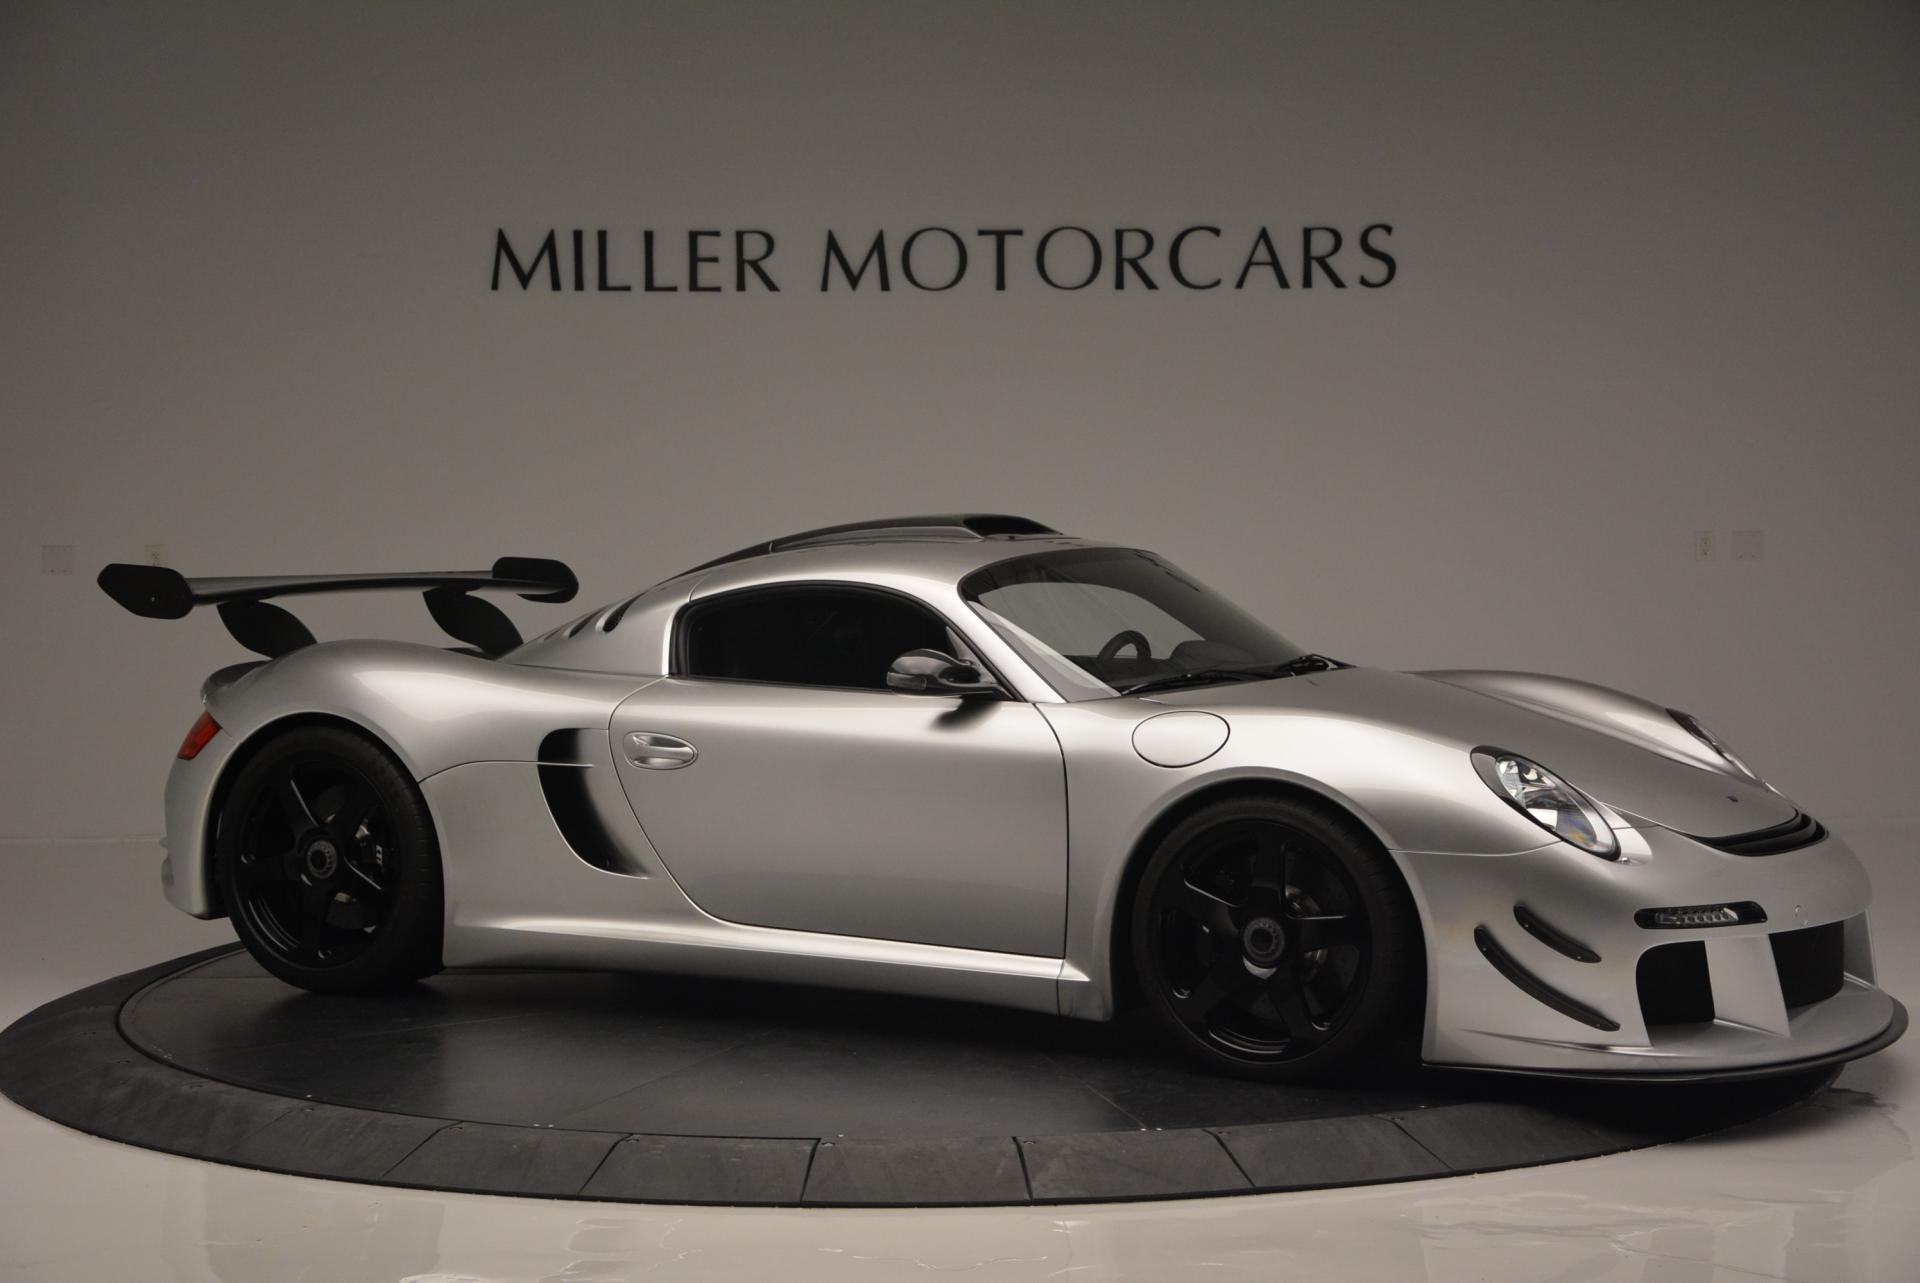 Used 2012 Porsche RUF CTR-3 Clubsport For Sale In Westport, CT 110_p13